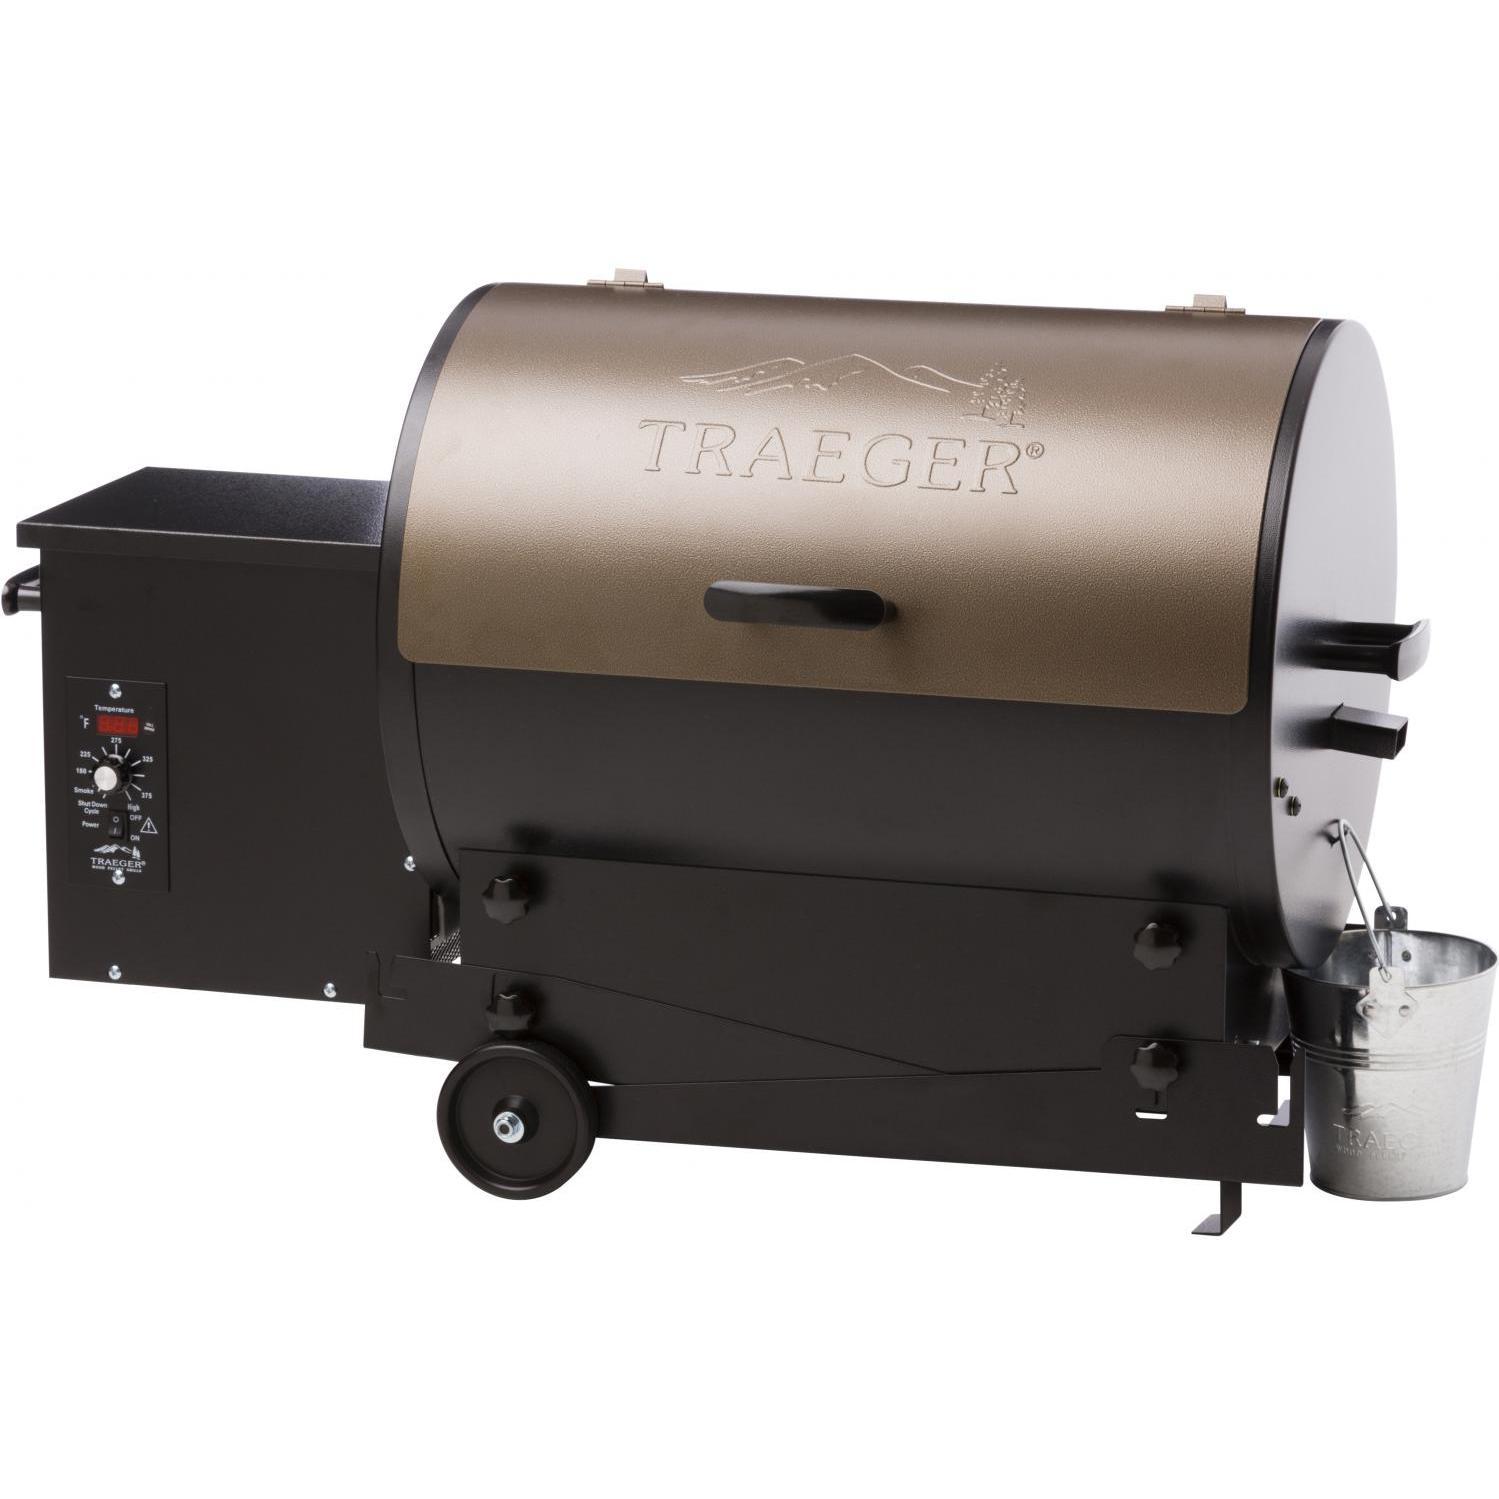 Traeger Tailgater Portable Wood Pellet Grill - Bronze